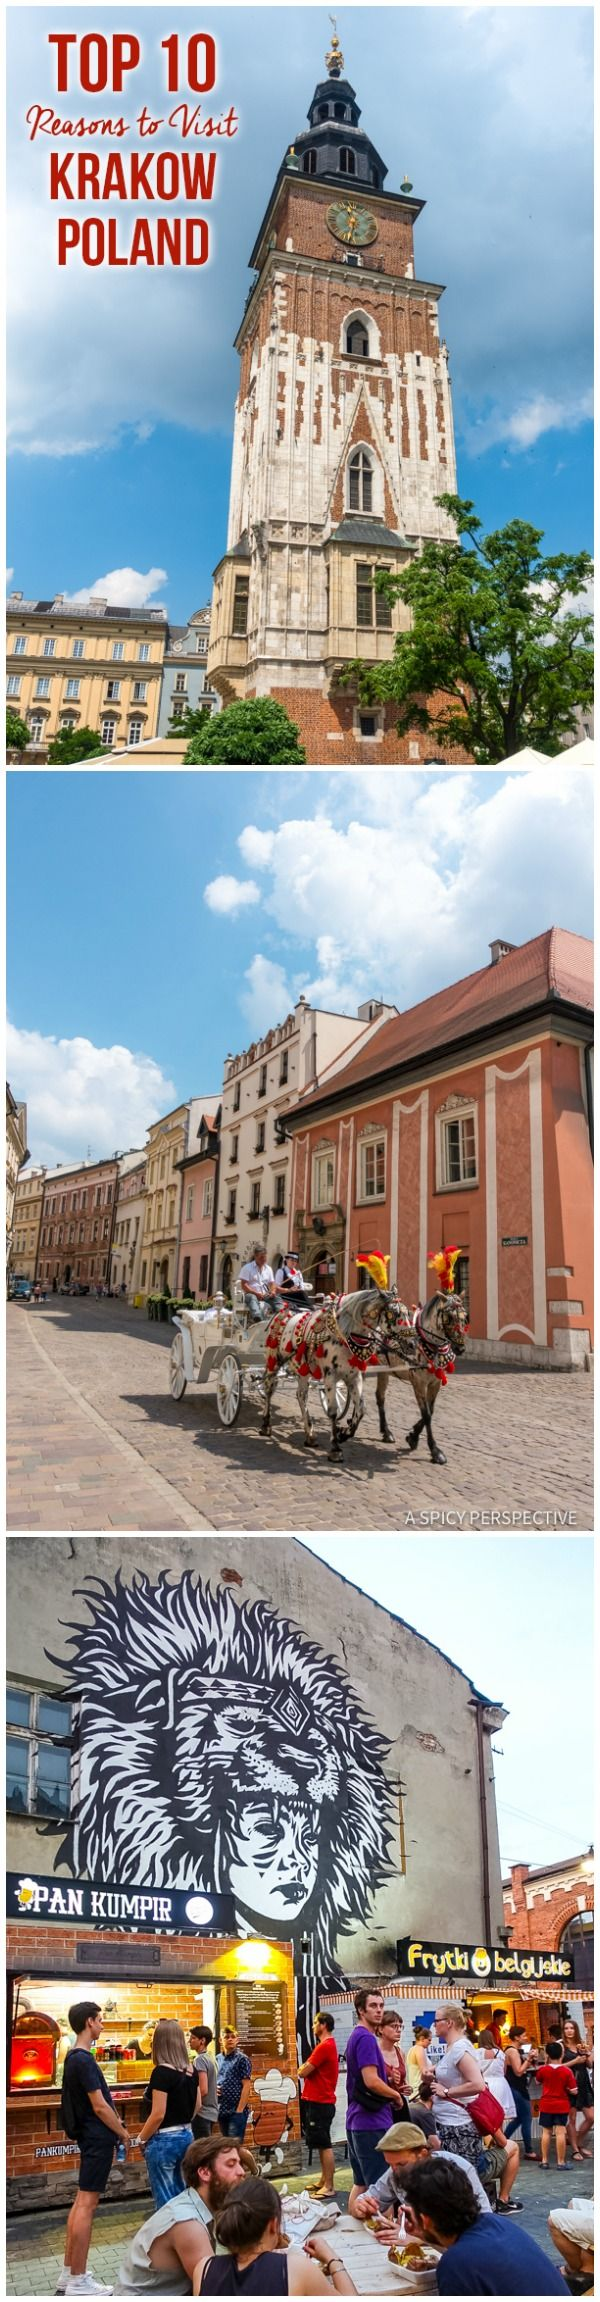 Best 10 Reasons to Visit Krakow, Poland   ASpicyPerspective.com #travel